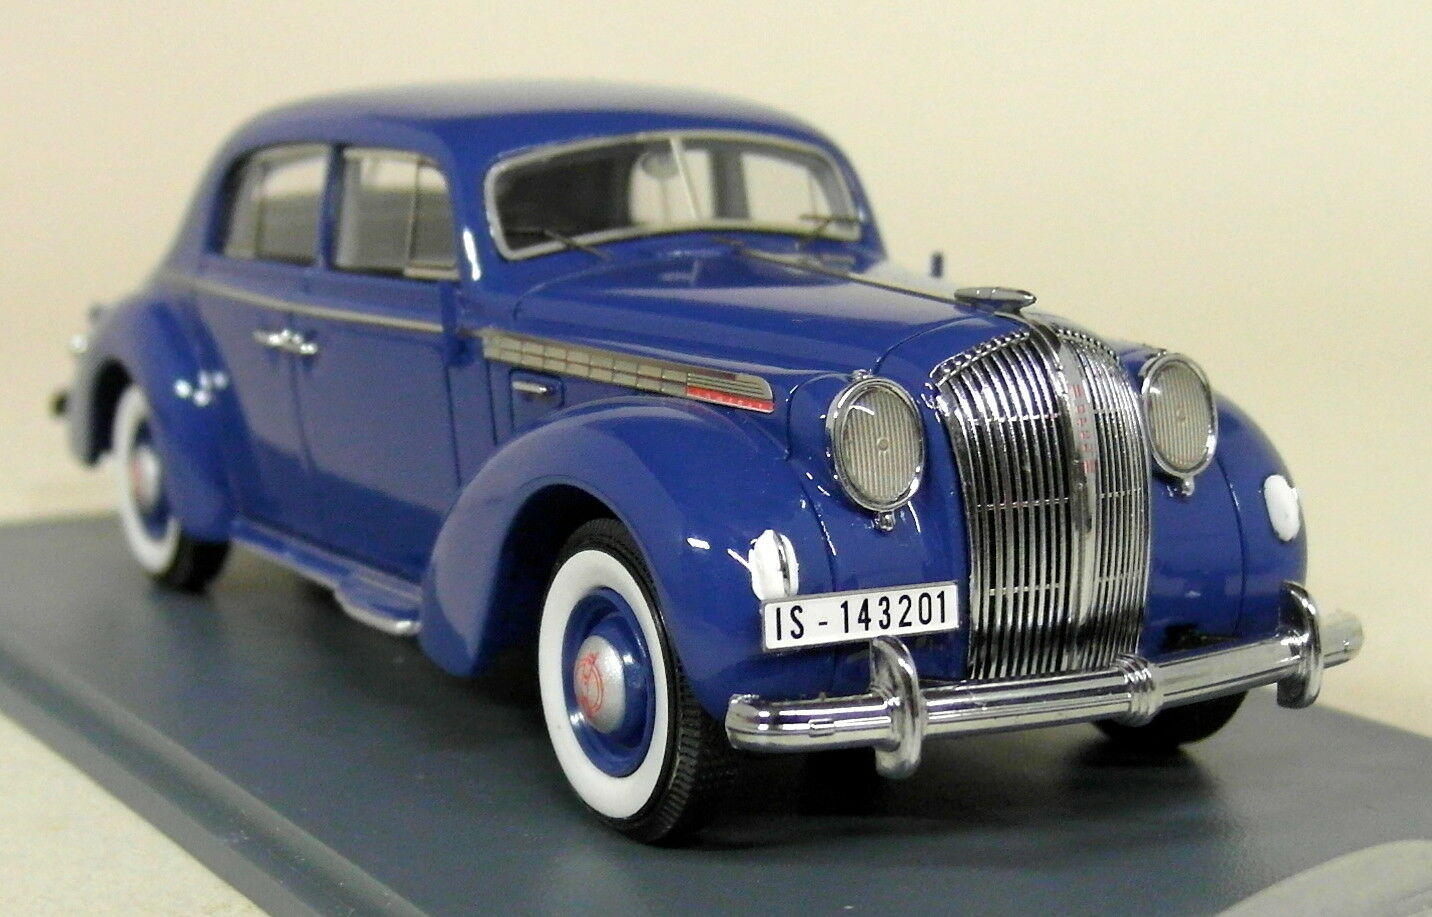 Der maßstab 1  43 - 43201 opel admiral limousine 1938 blaue harz modell auto